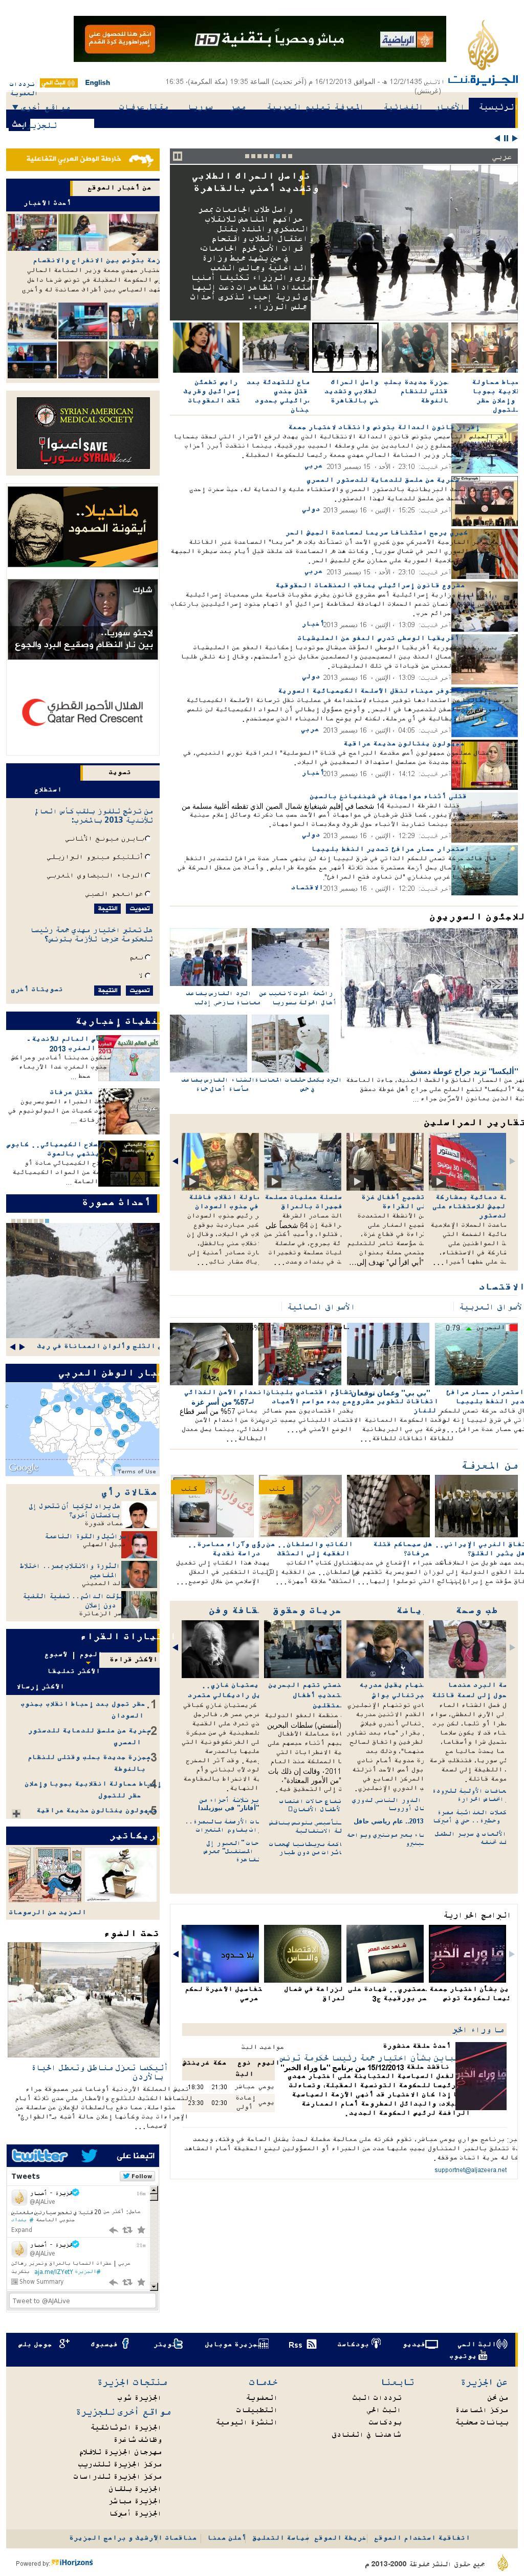 Al Jazeera at Monday Dec. 16, 2013, 5:08 p.m. UTC